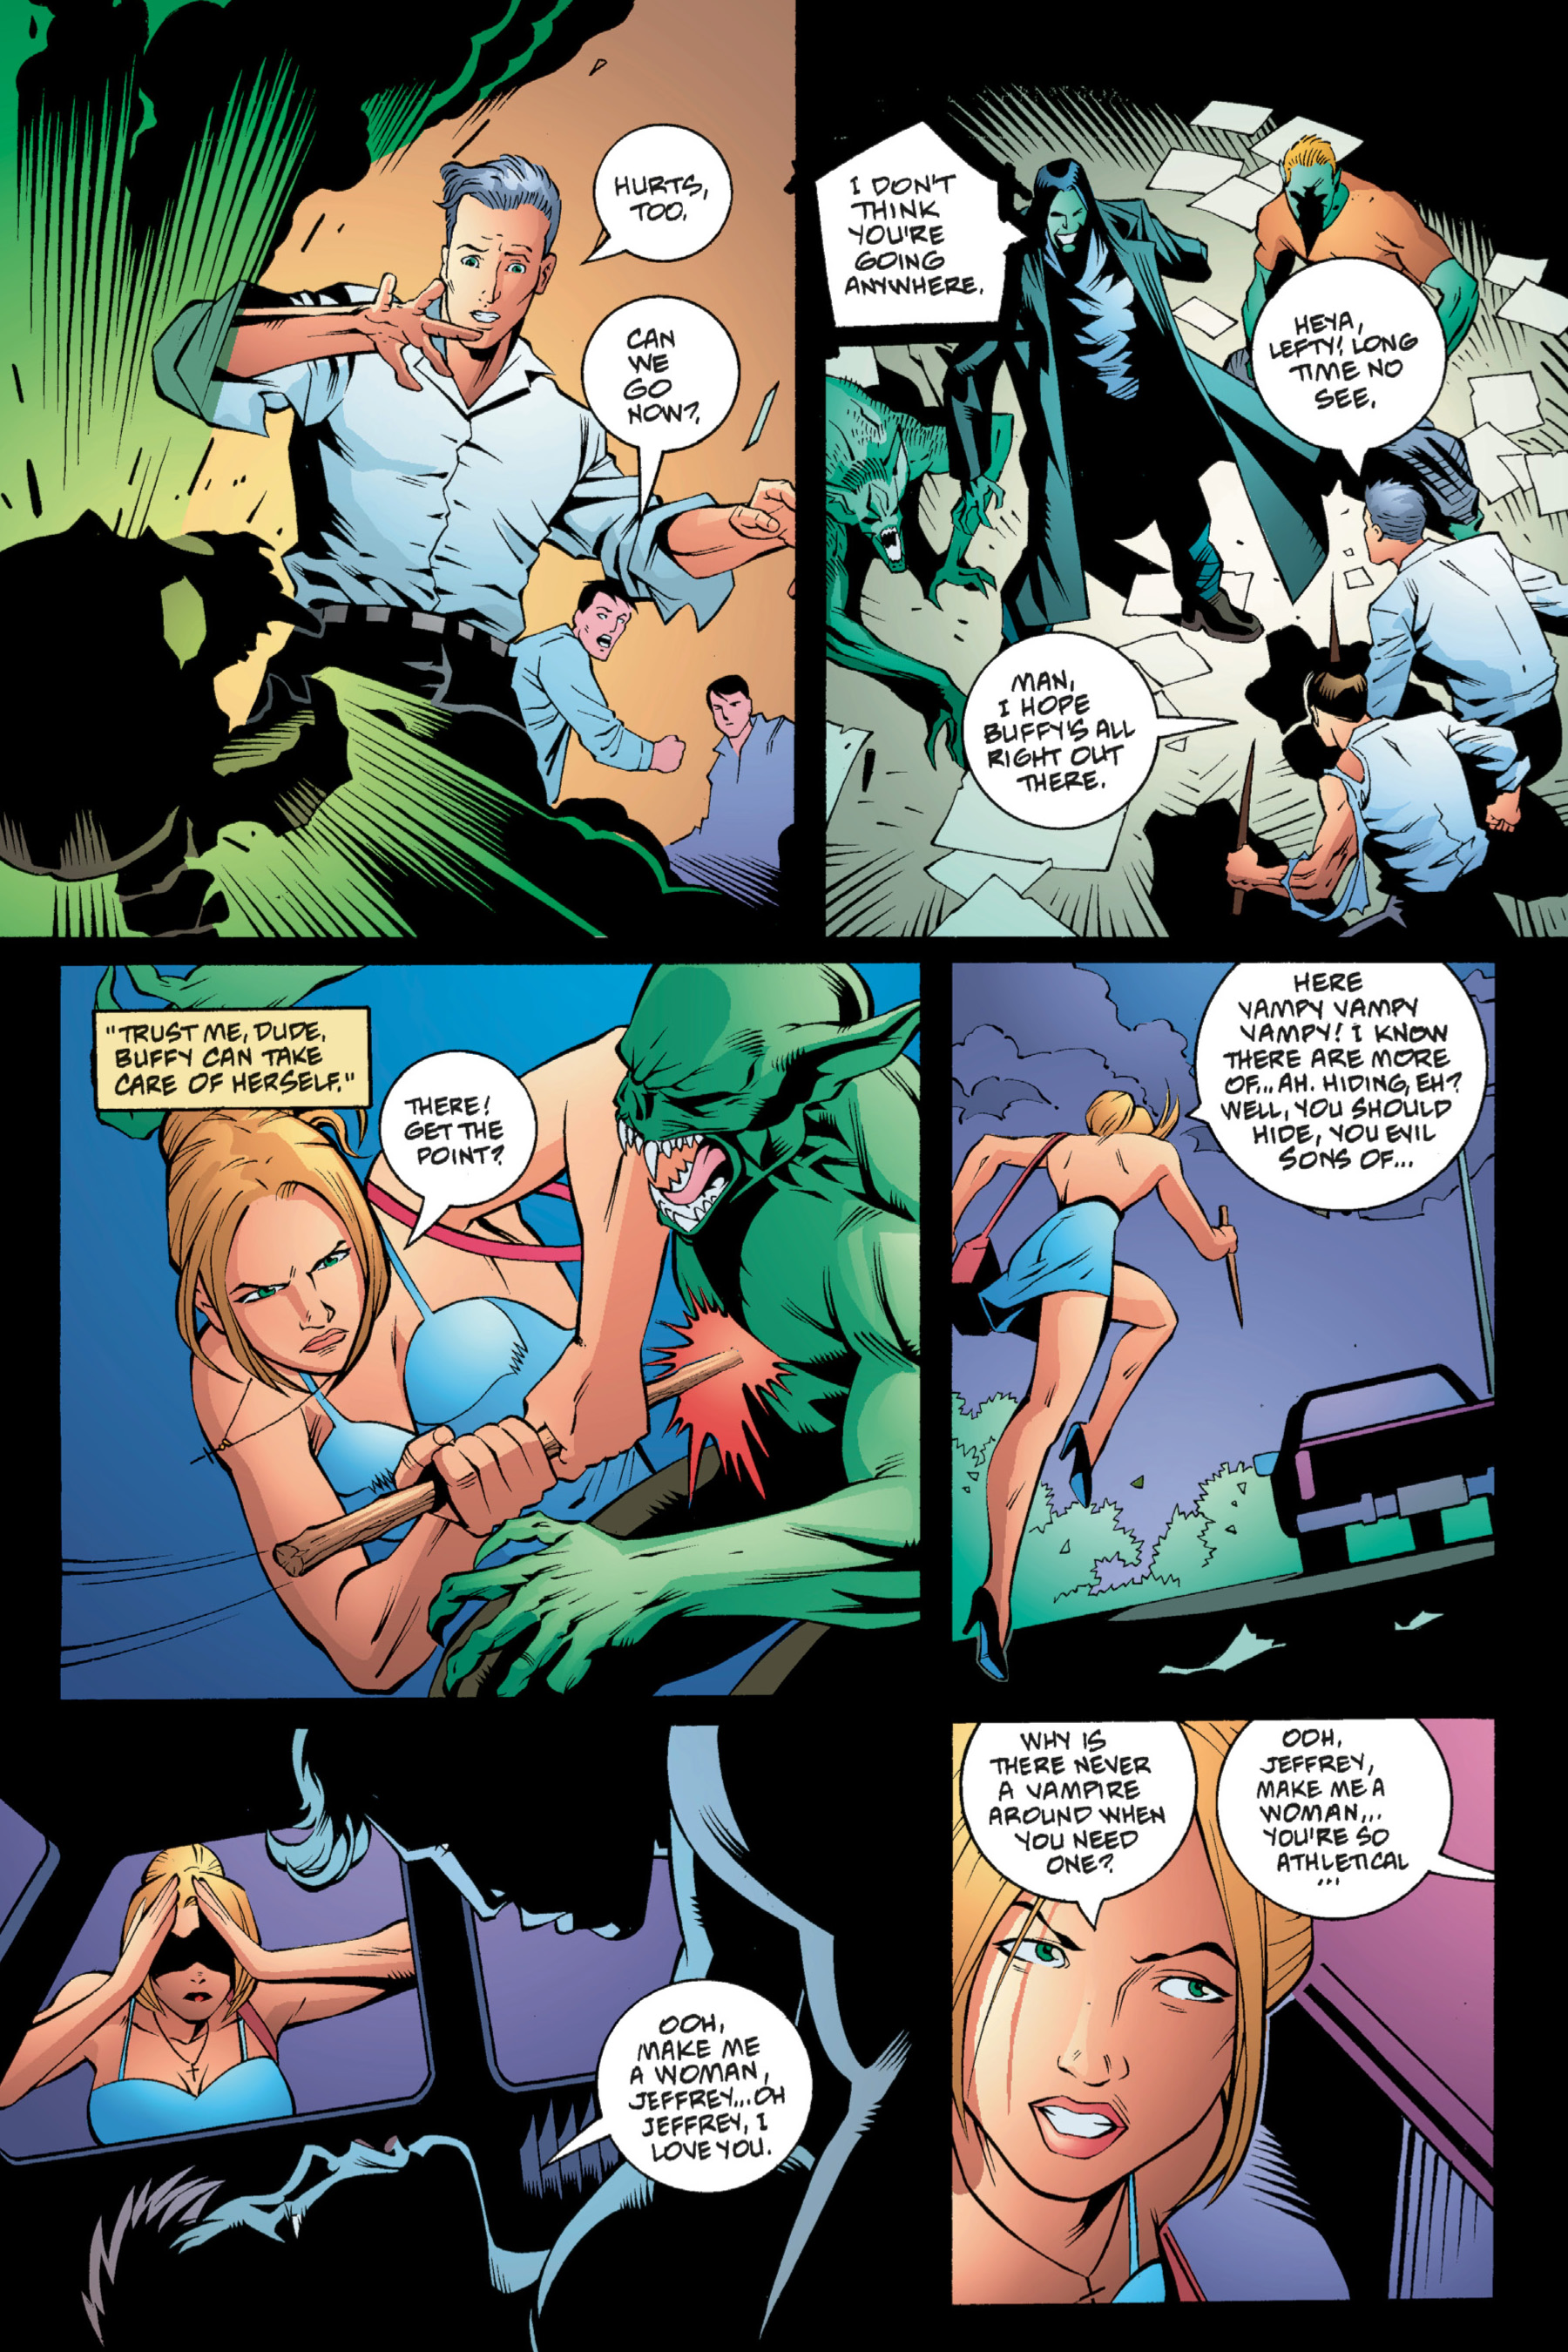 Read online Buffy the Vampire Slayer: Omnibus comic -  Issue # TPB 1 - 94